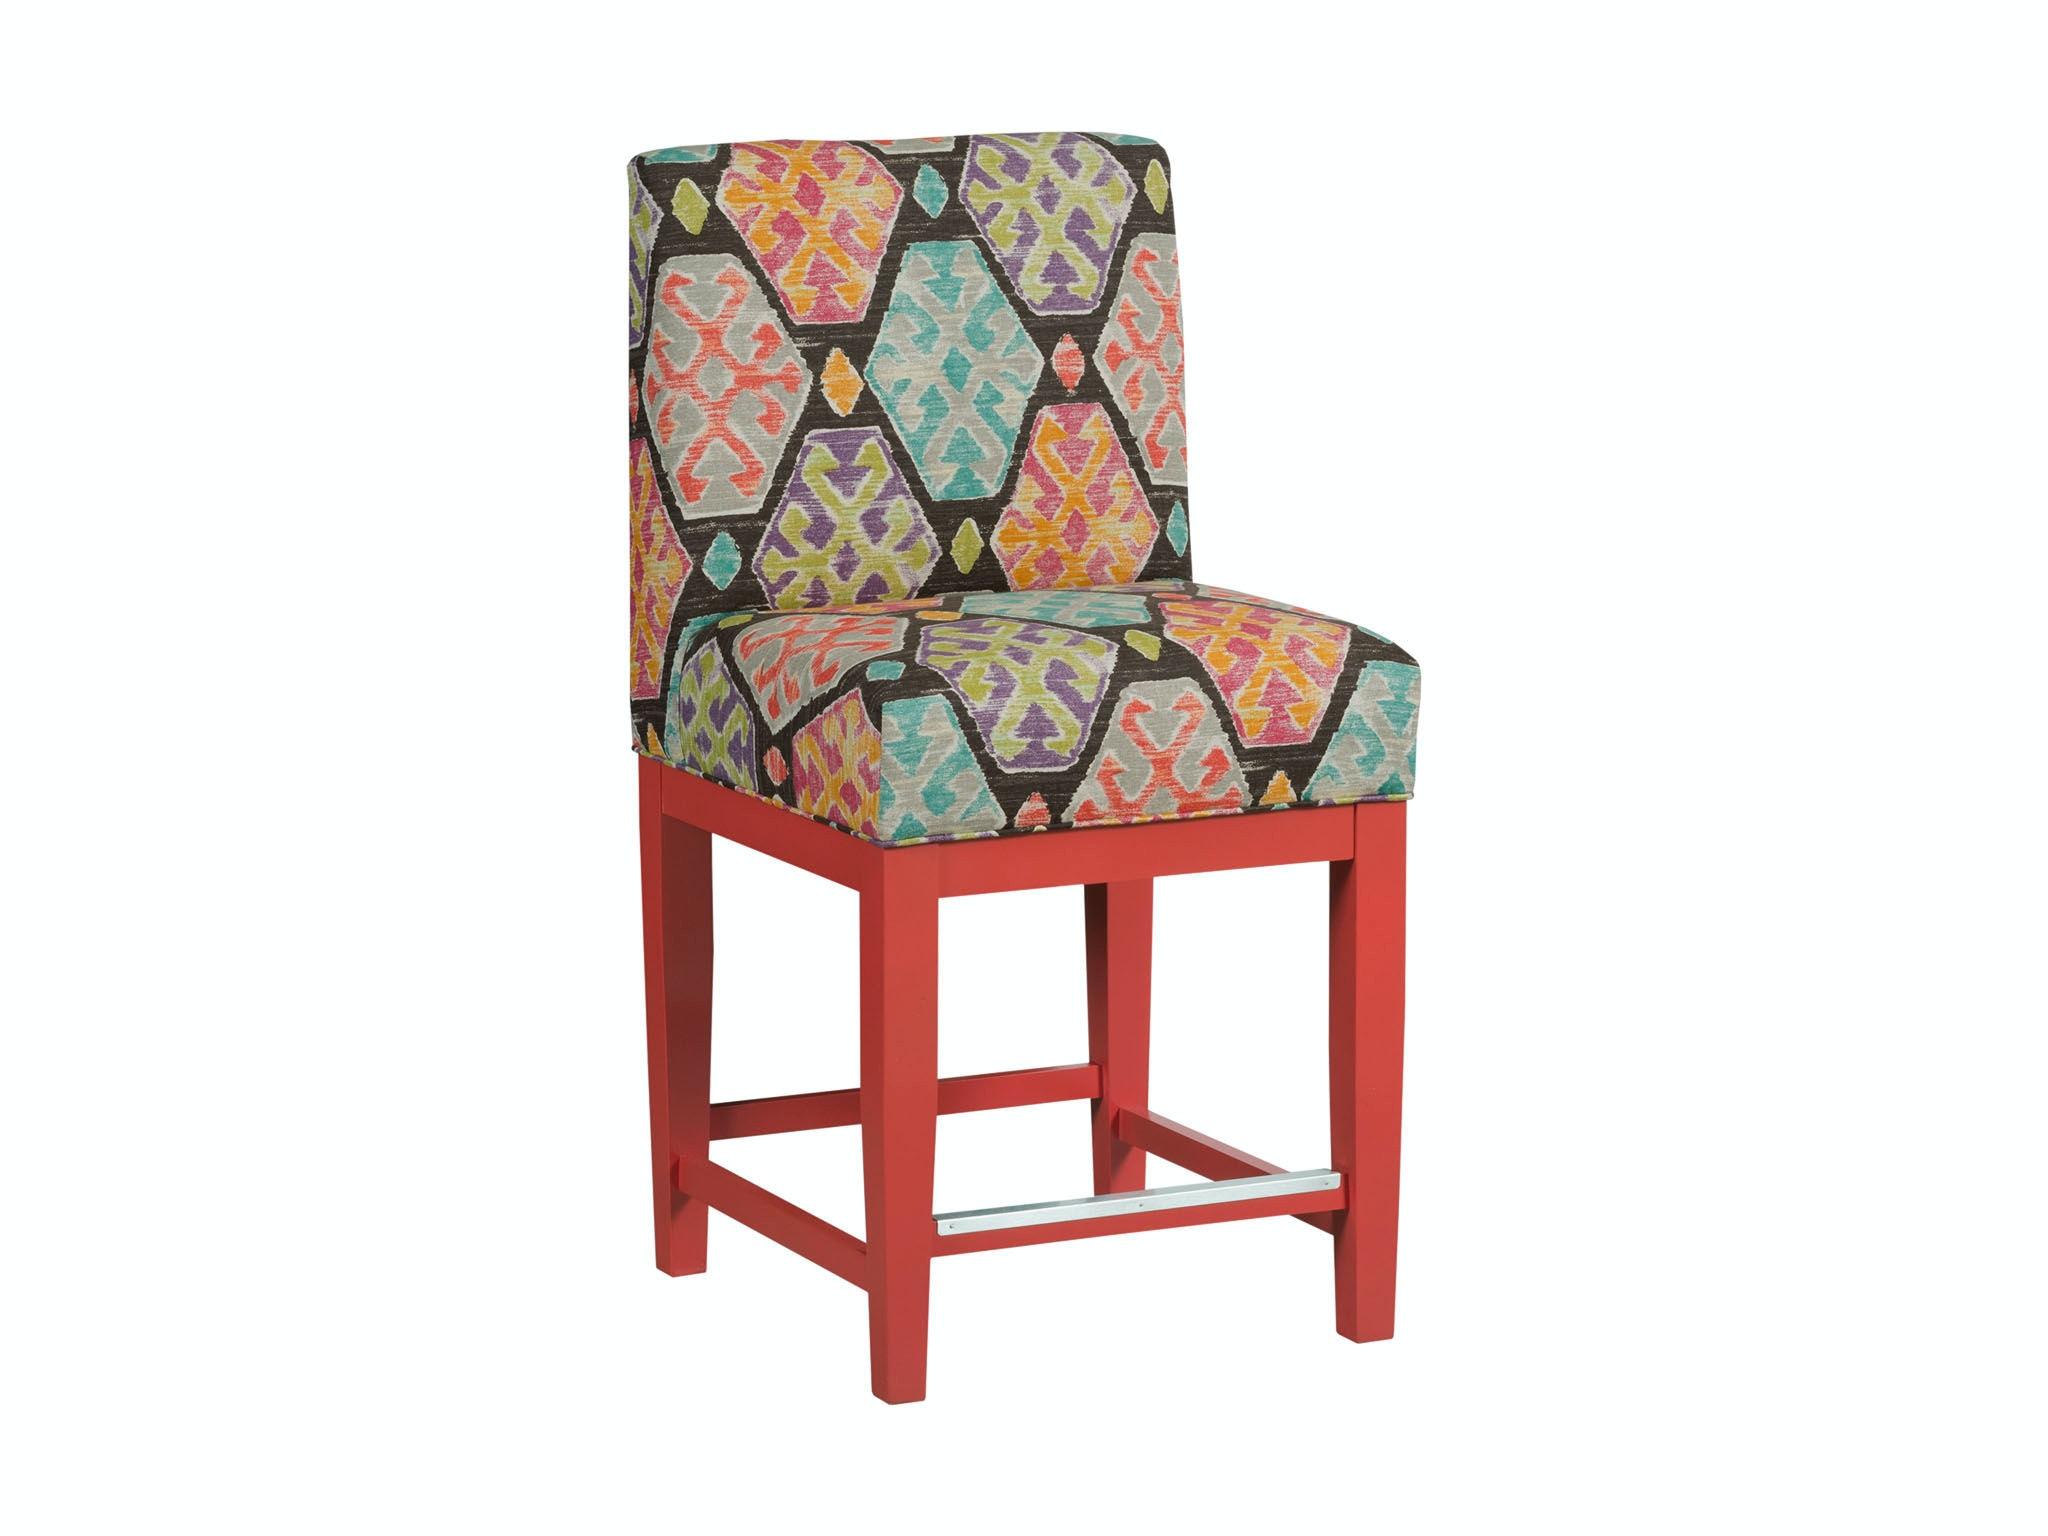 Kincaid Furniture Counter Stool 001 03